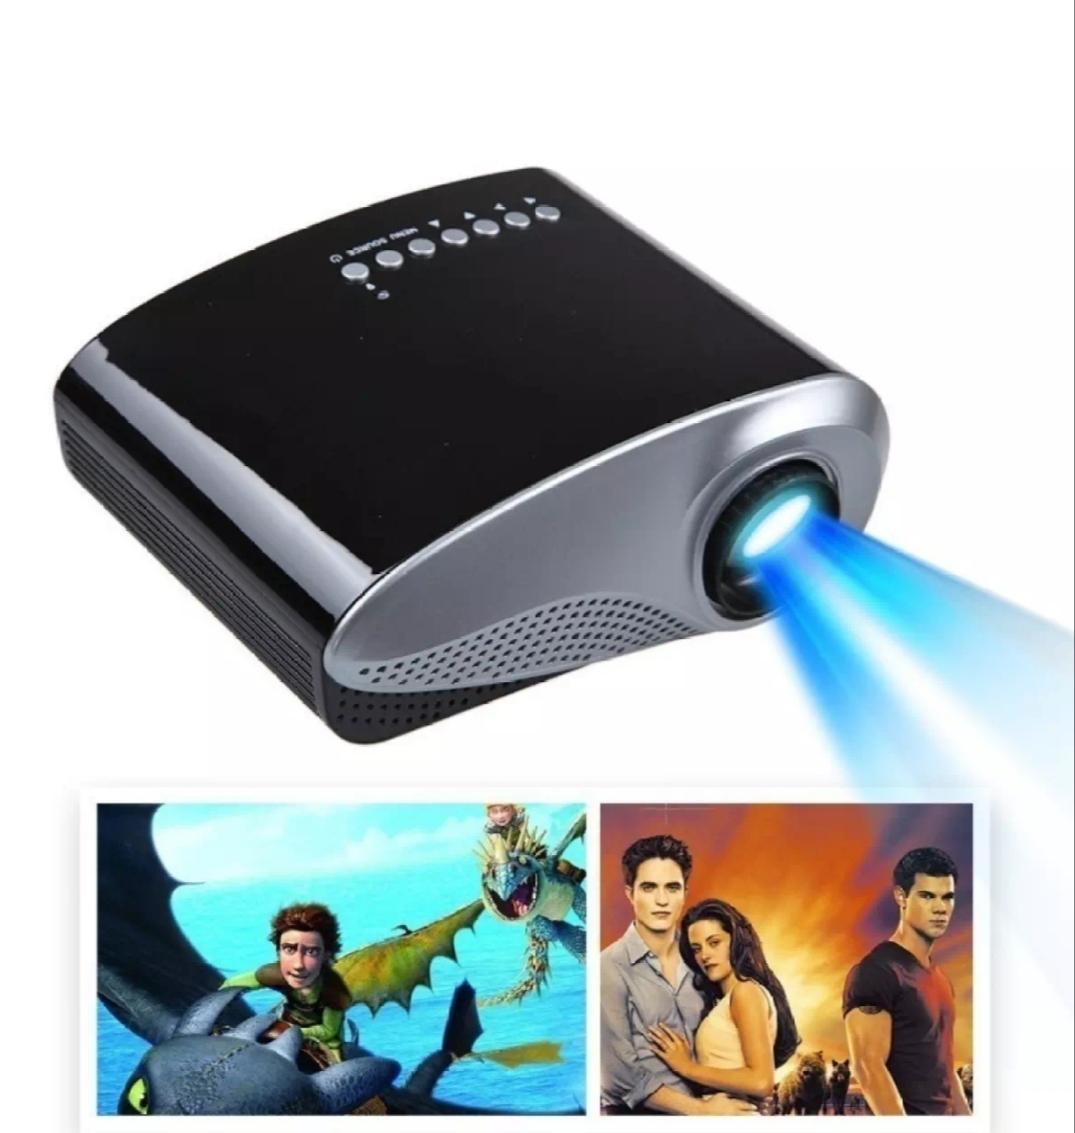 Infocus Cus Projector In224 Svga Hdmi Mini Home Multimedia Cinema Led Hd 1080 P 1200 Lumens Support Av Composite